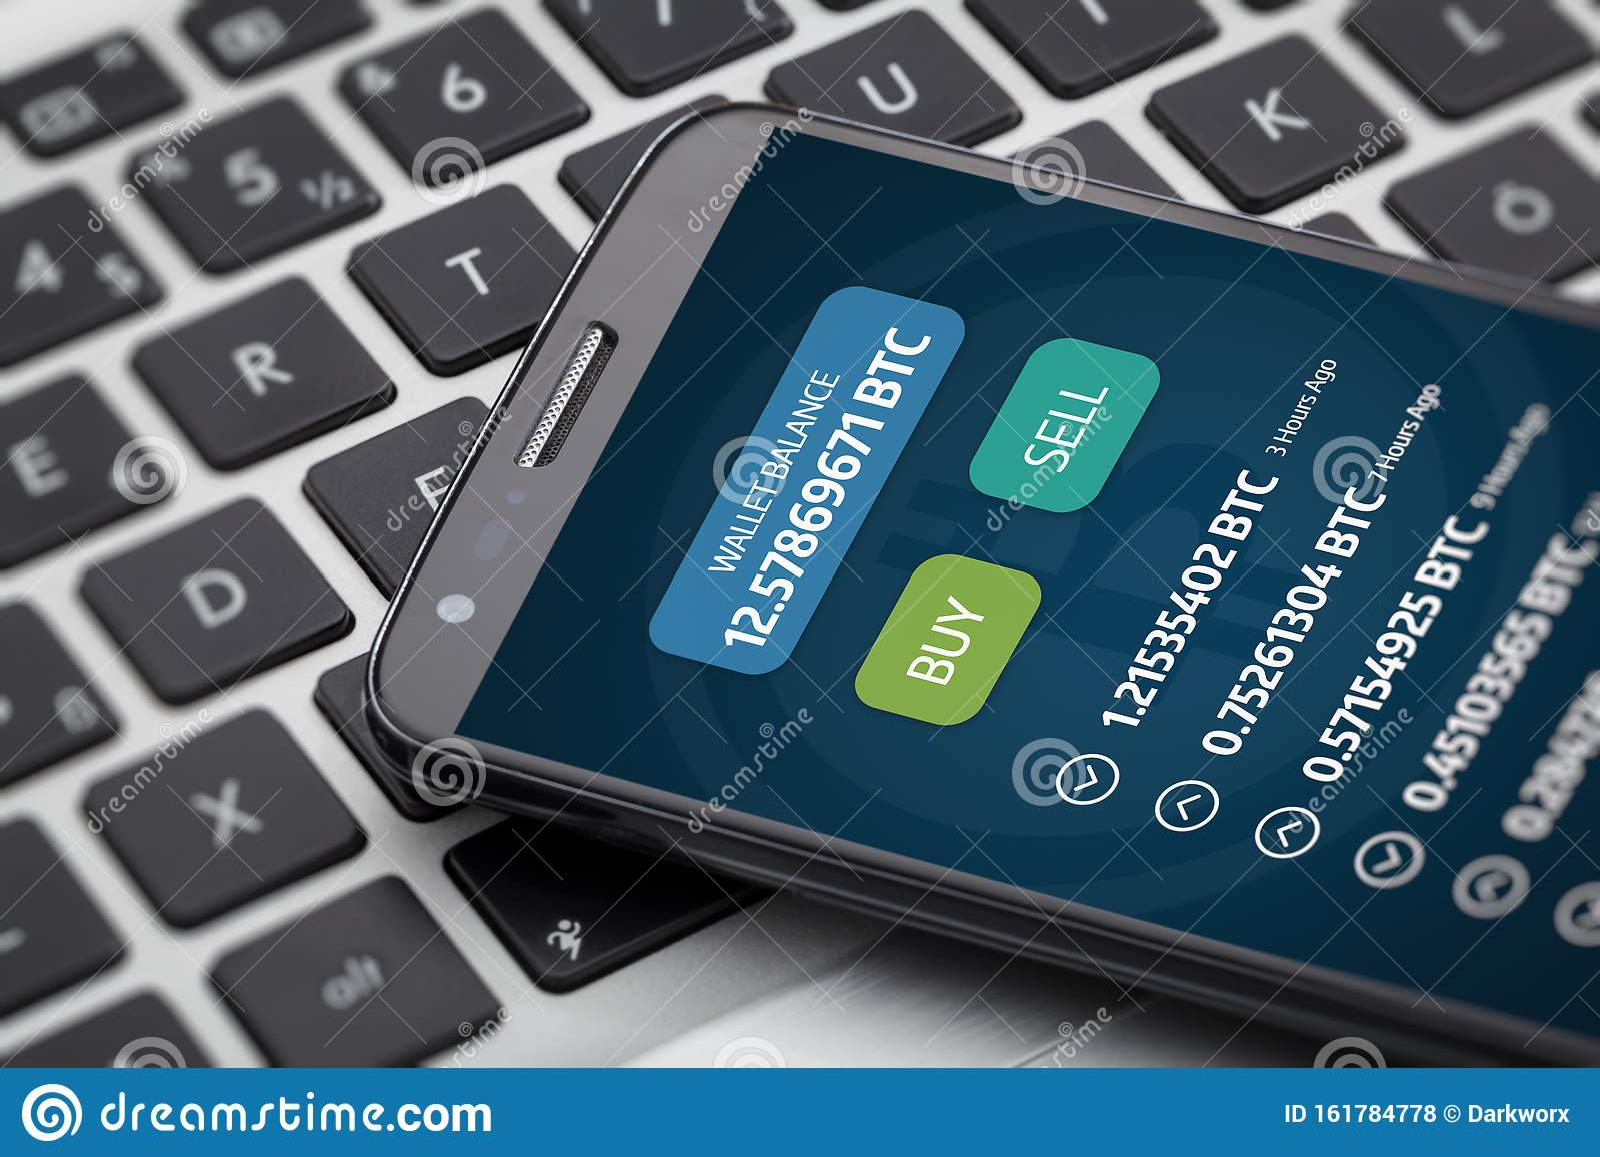 btc smart phone